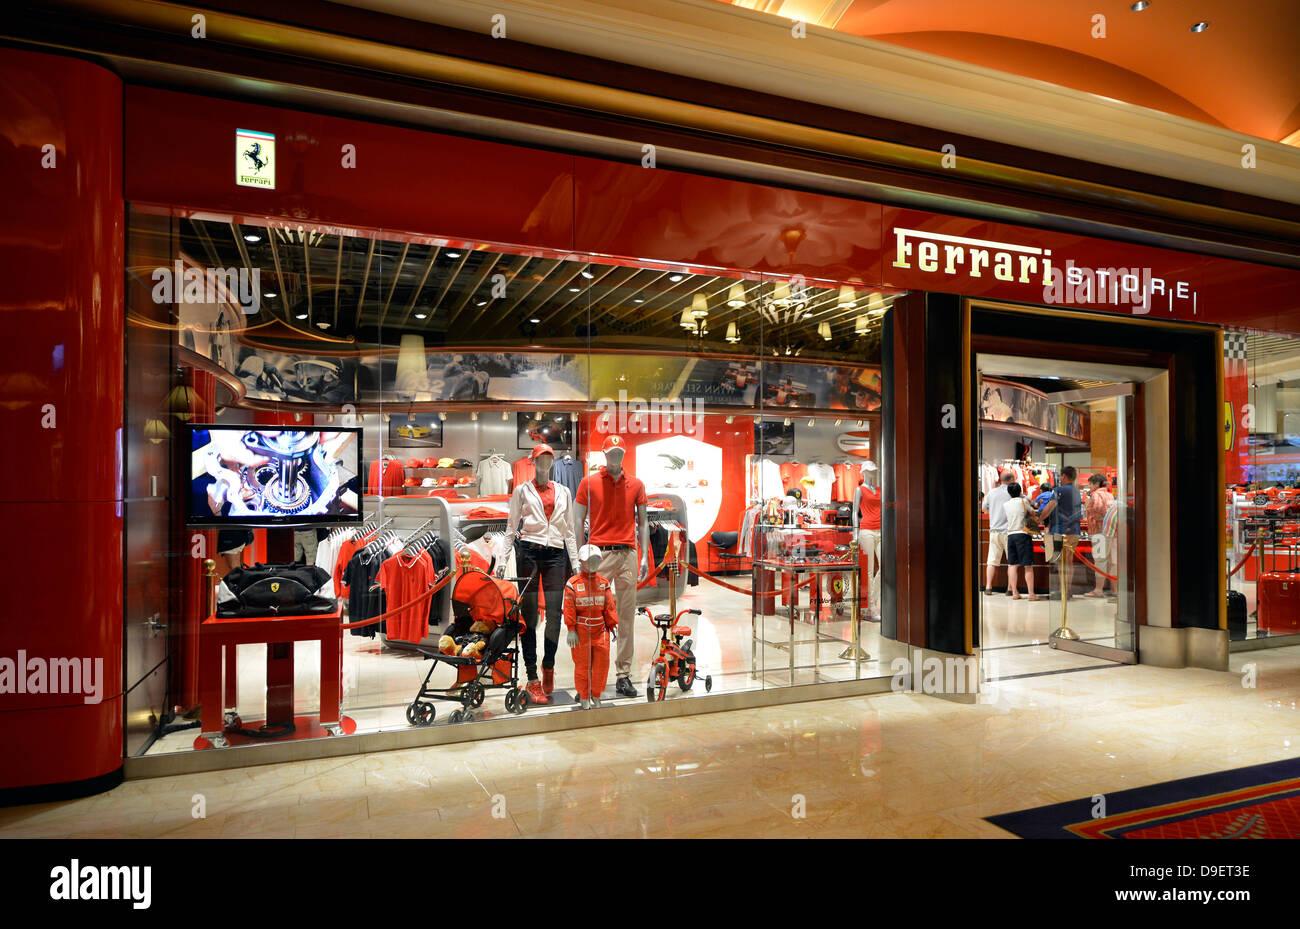 ferrari shop, five-star hotel casino wynn, las vegas, nevada, the